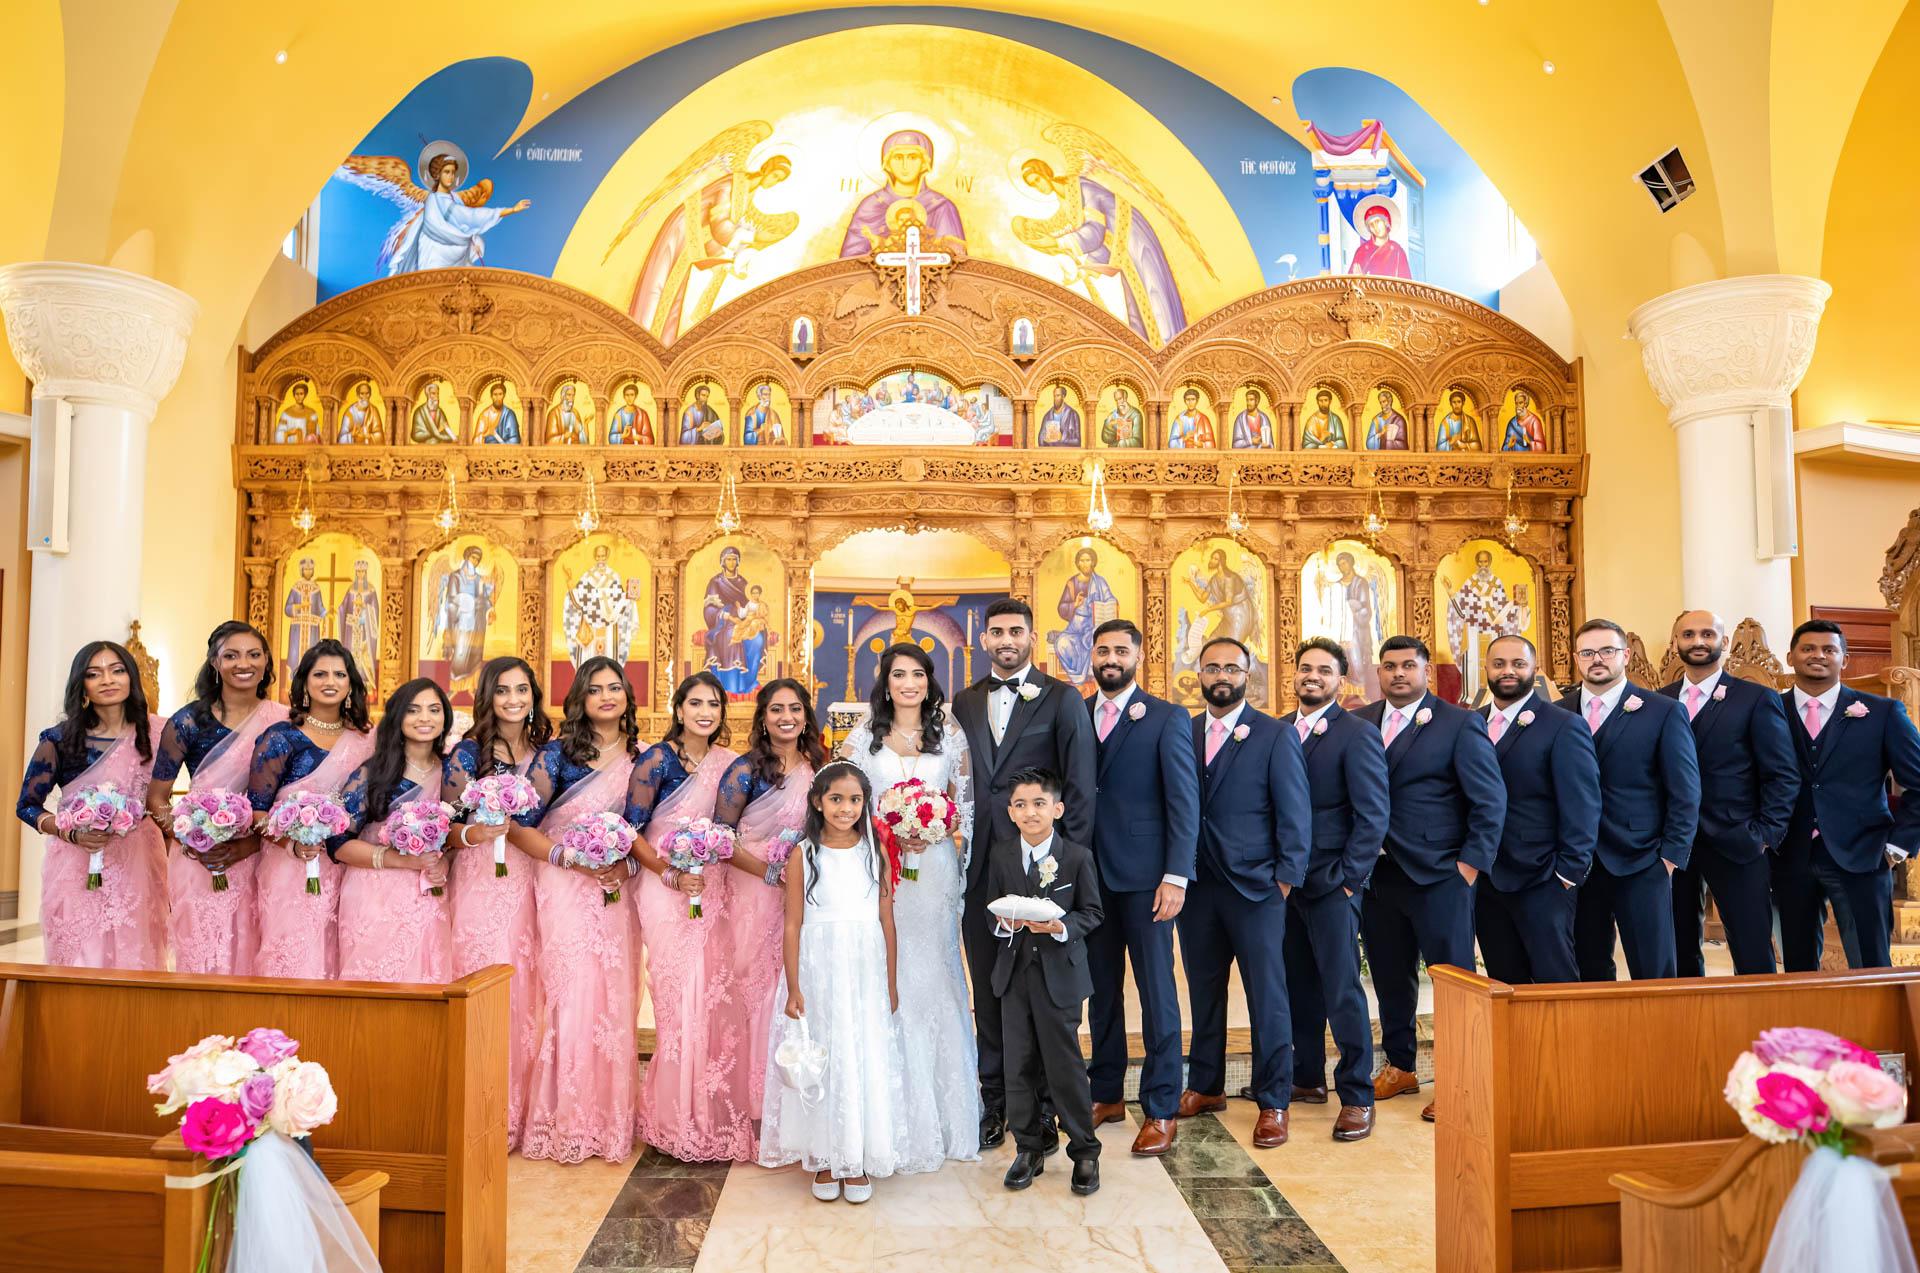 WESTMOUNT COUNTRY CLUB INDIAN WEDDING 19